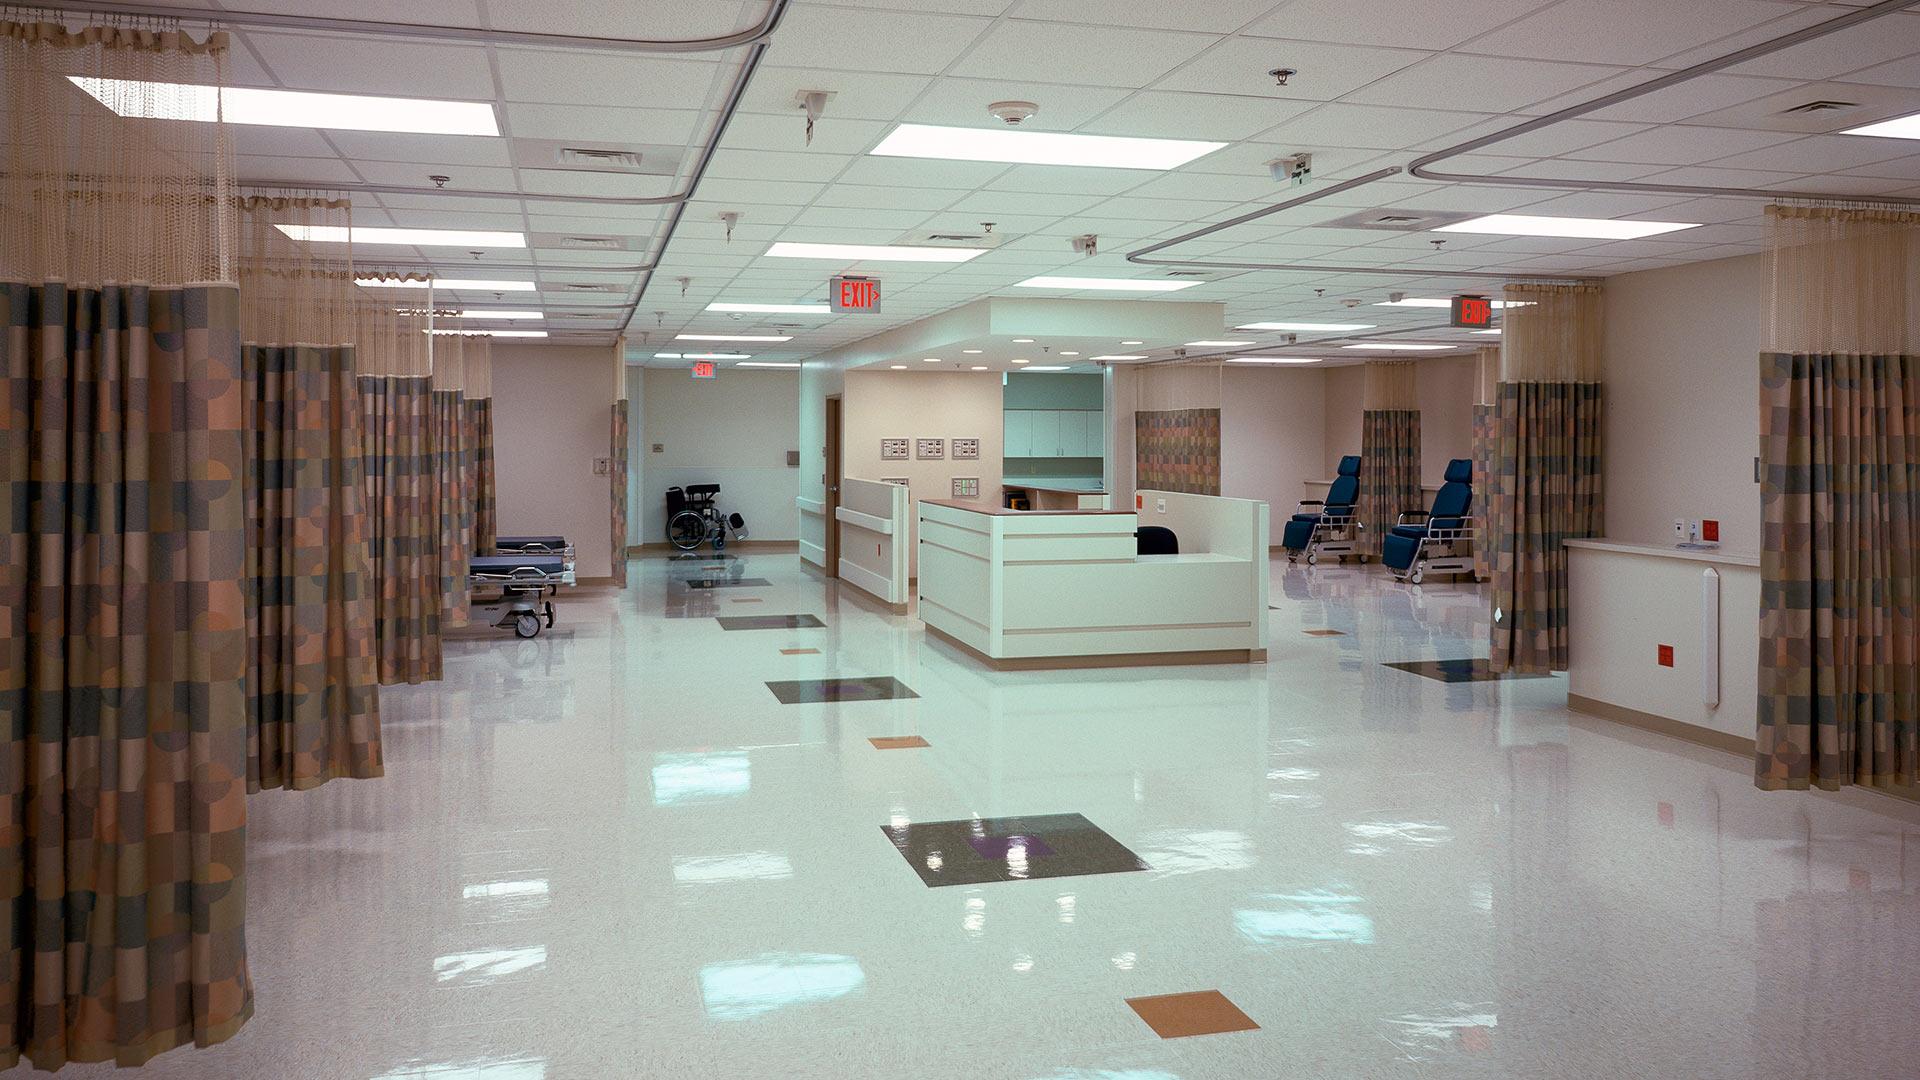 North Shore Ambulatory Surgery Center